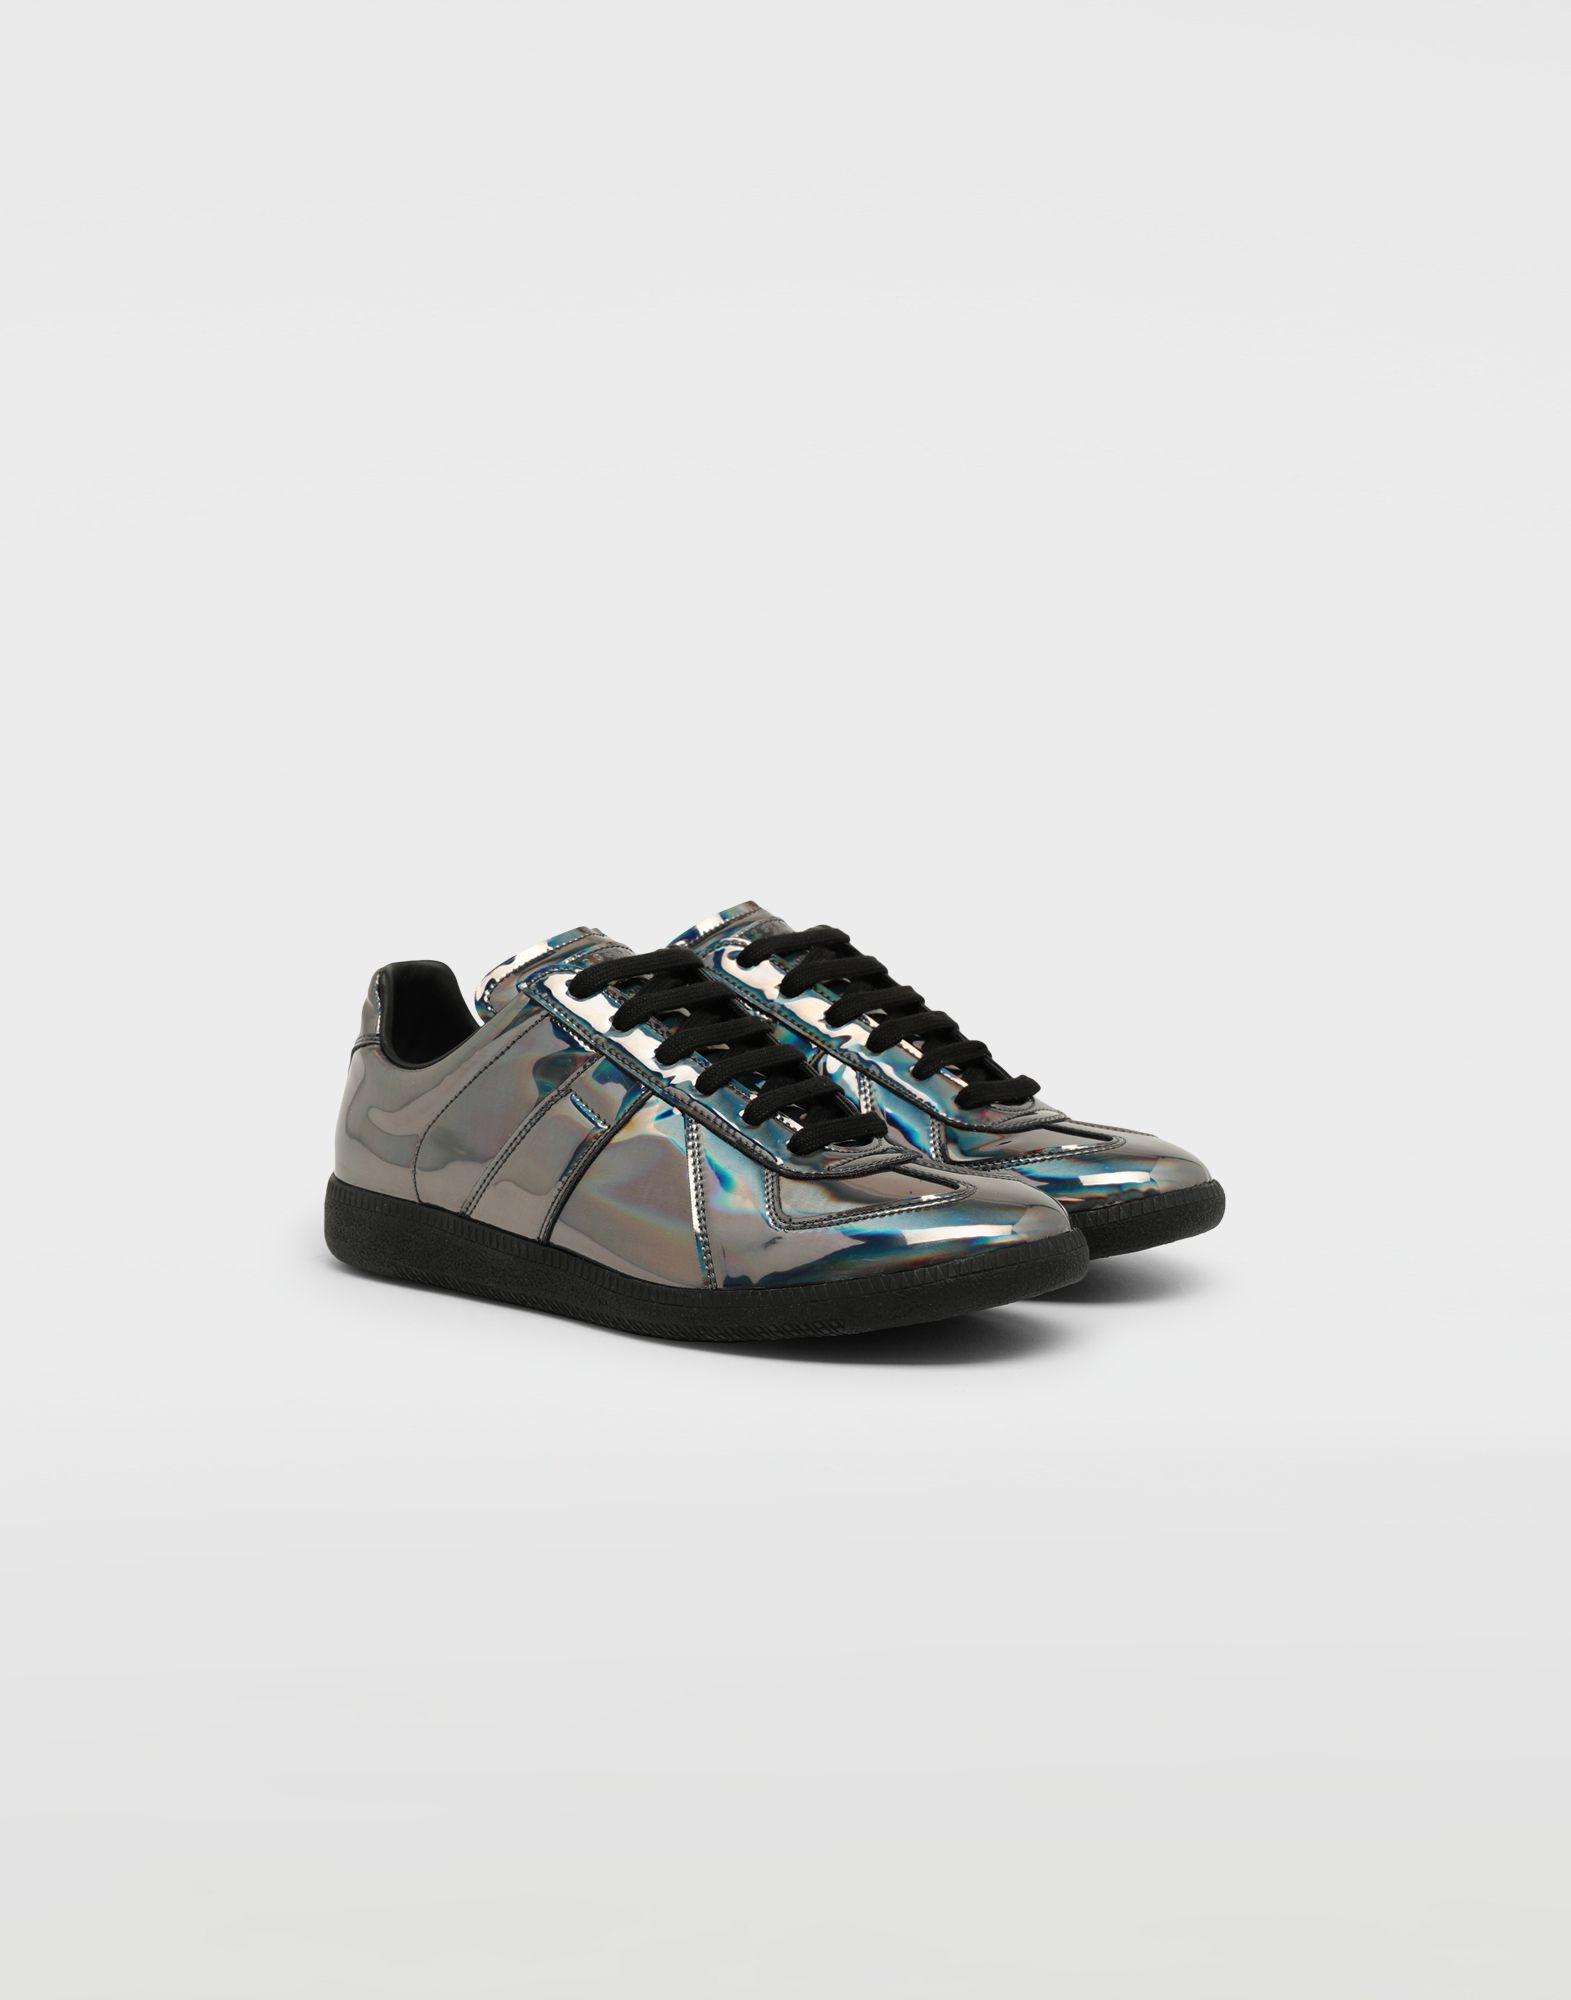 MAISON MARGIELA Replica low top hologram sneakers Sneakers Man r